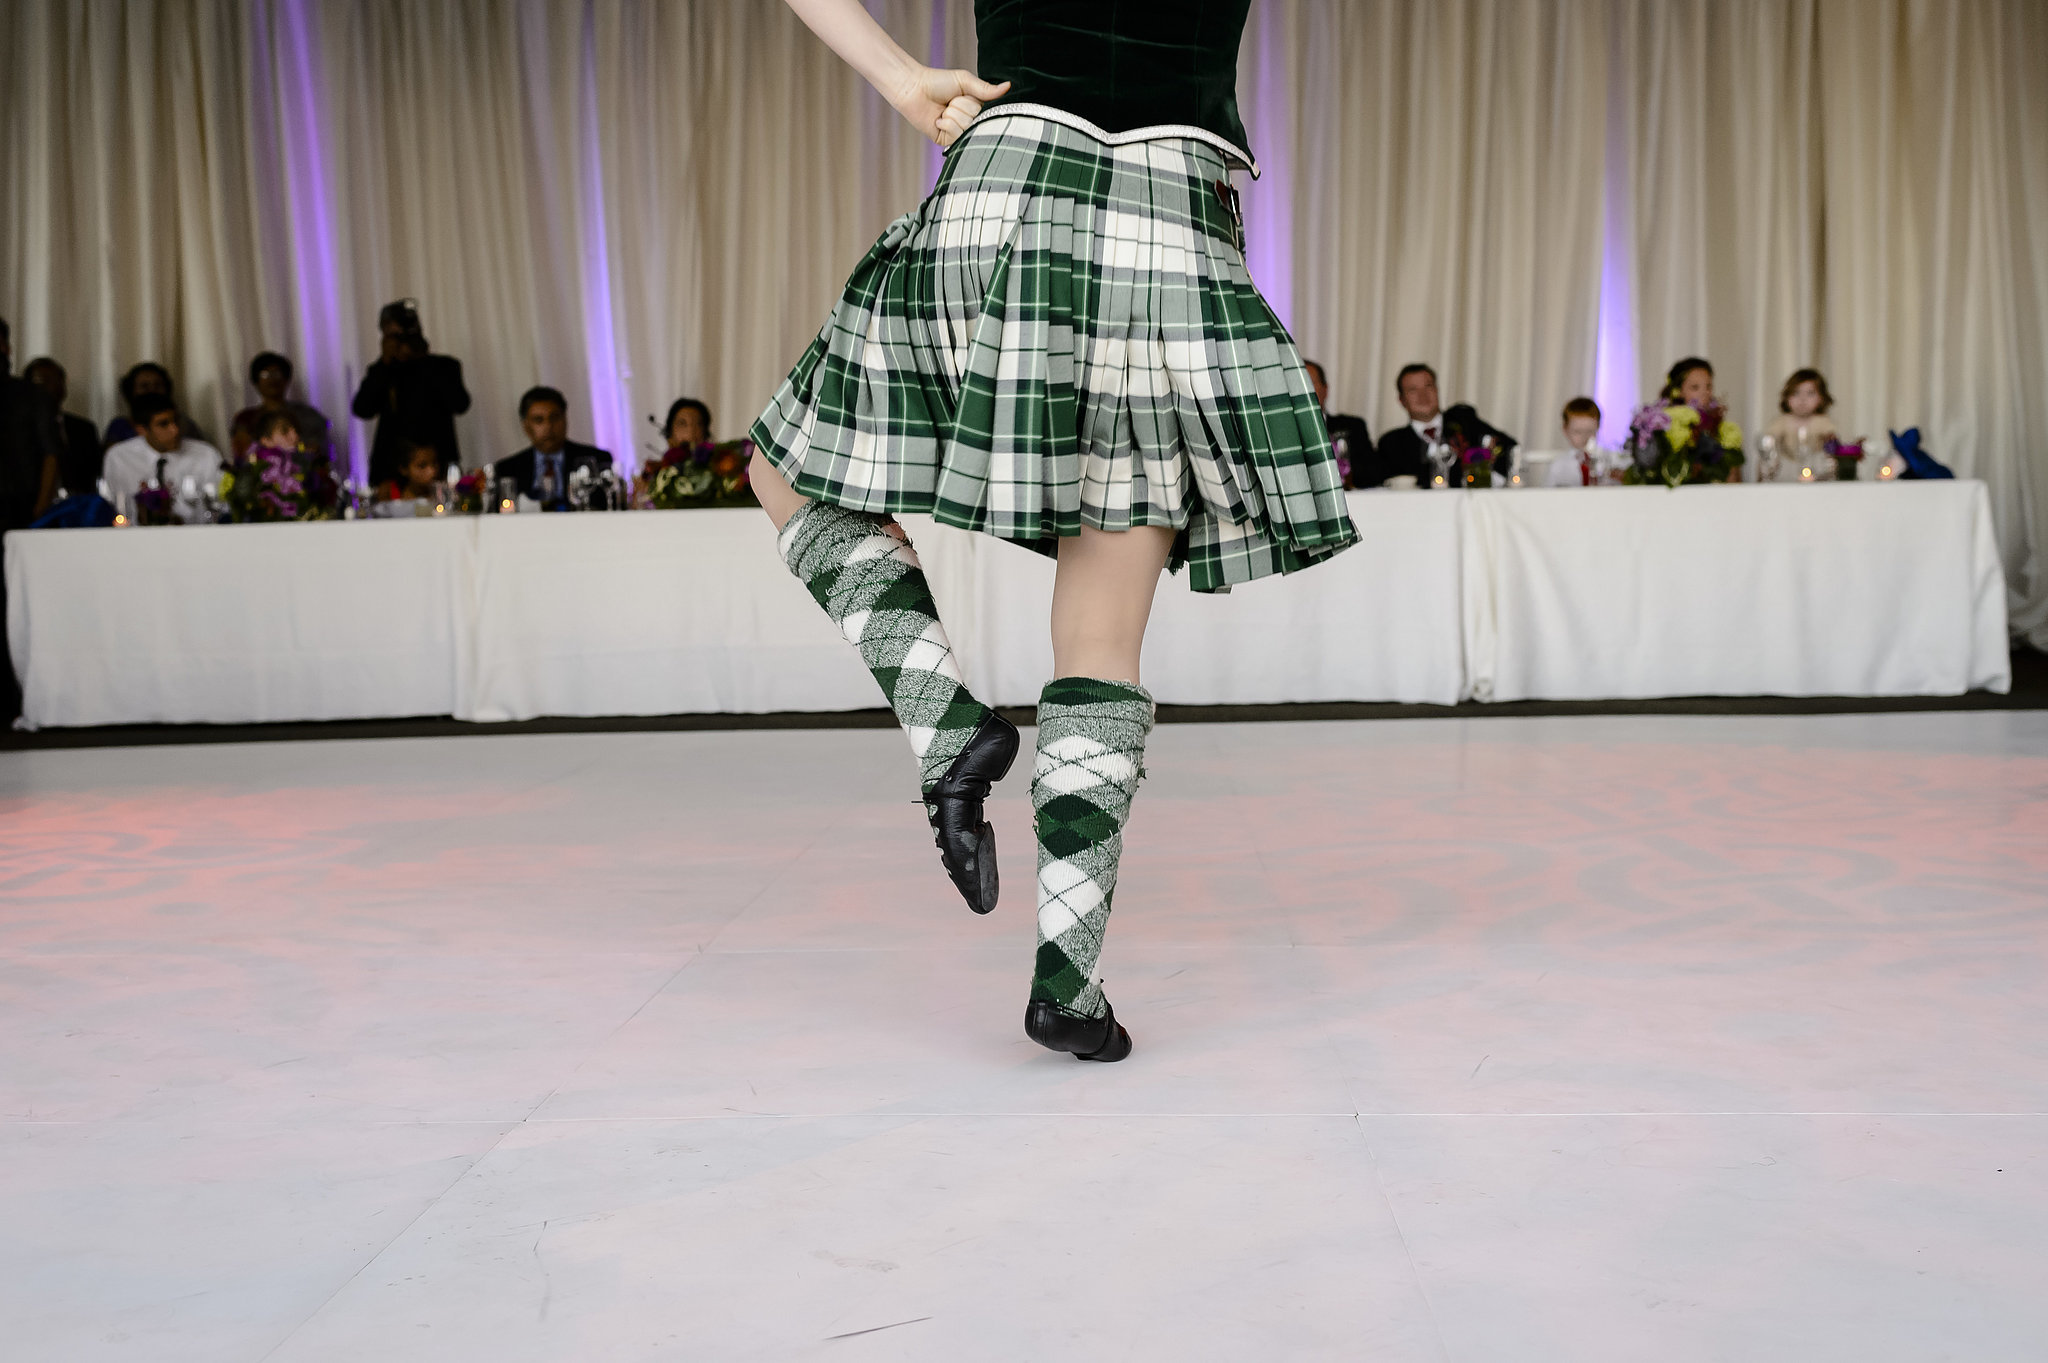 Reception entertainment included Scottish dancers. Photo by Chrisman Studios